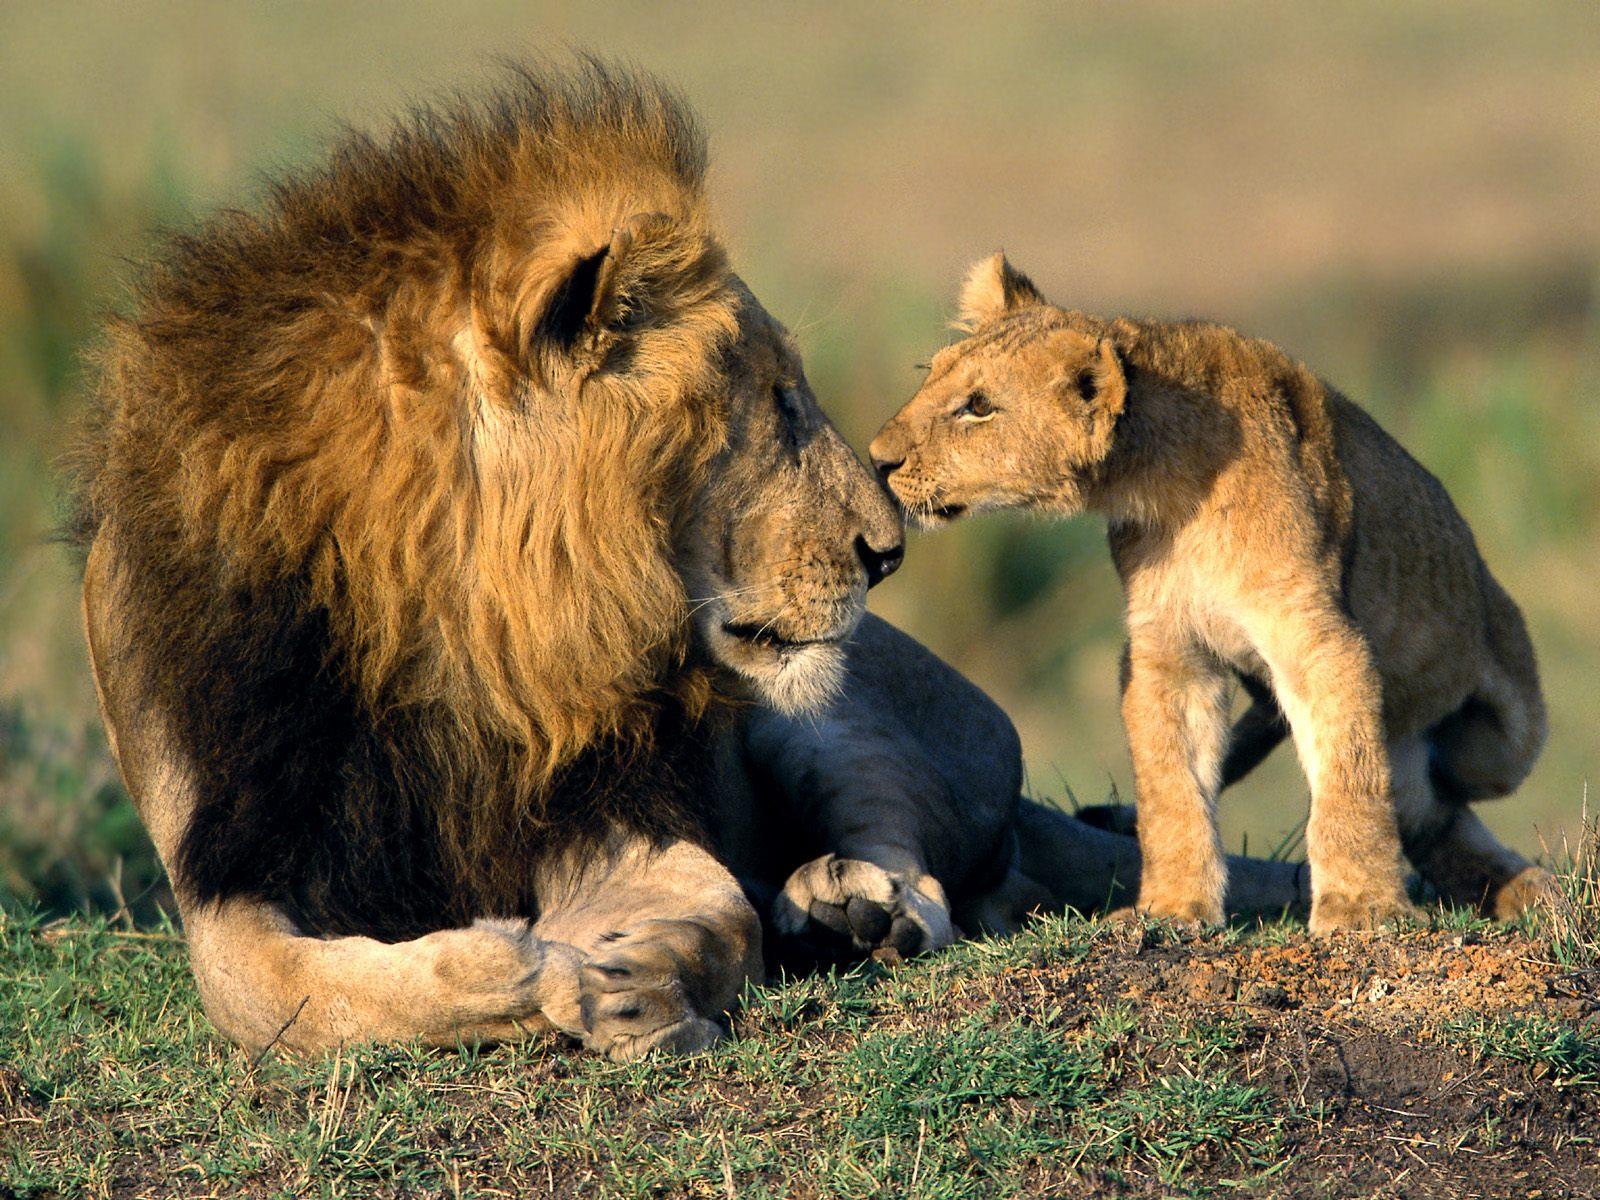 lion and cub relationship quiz